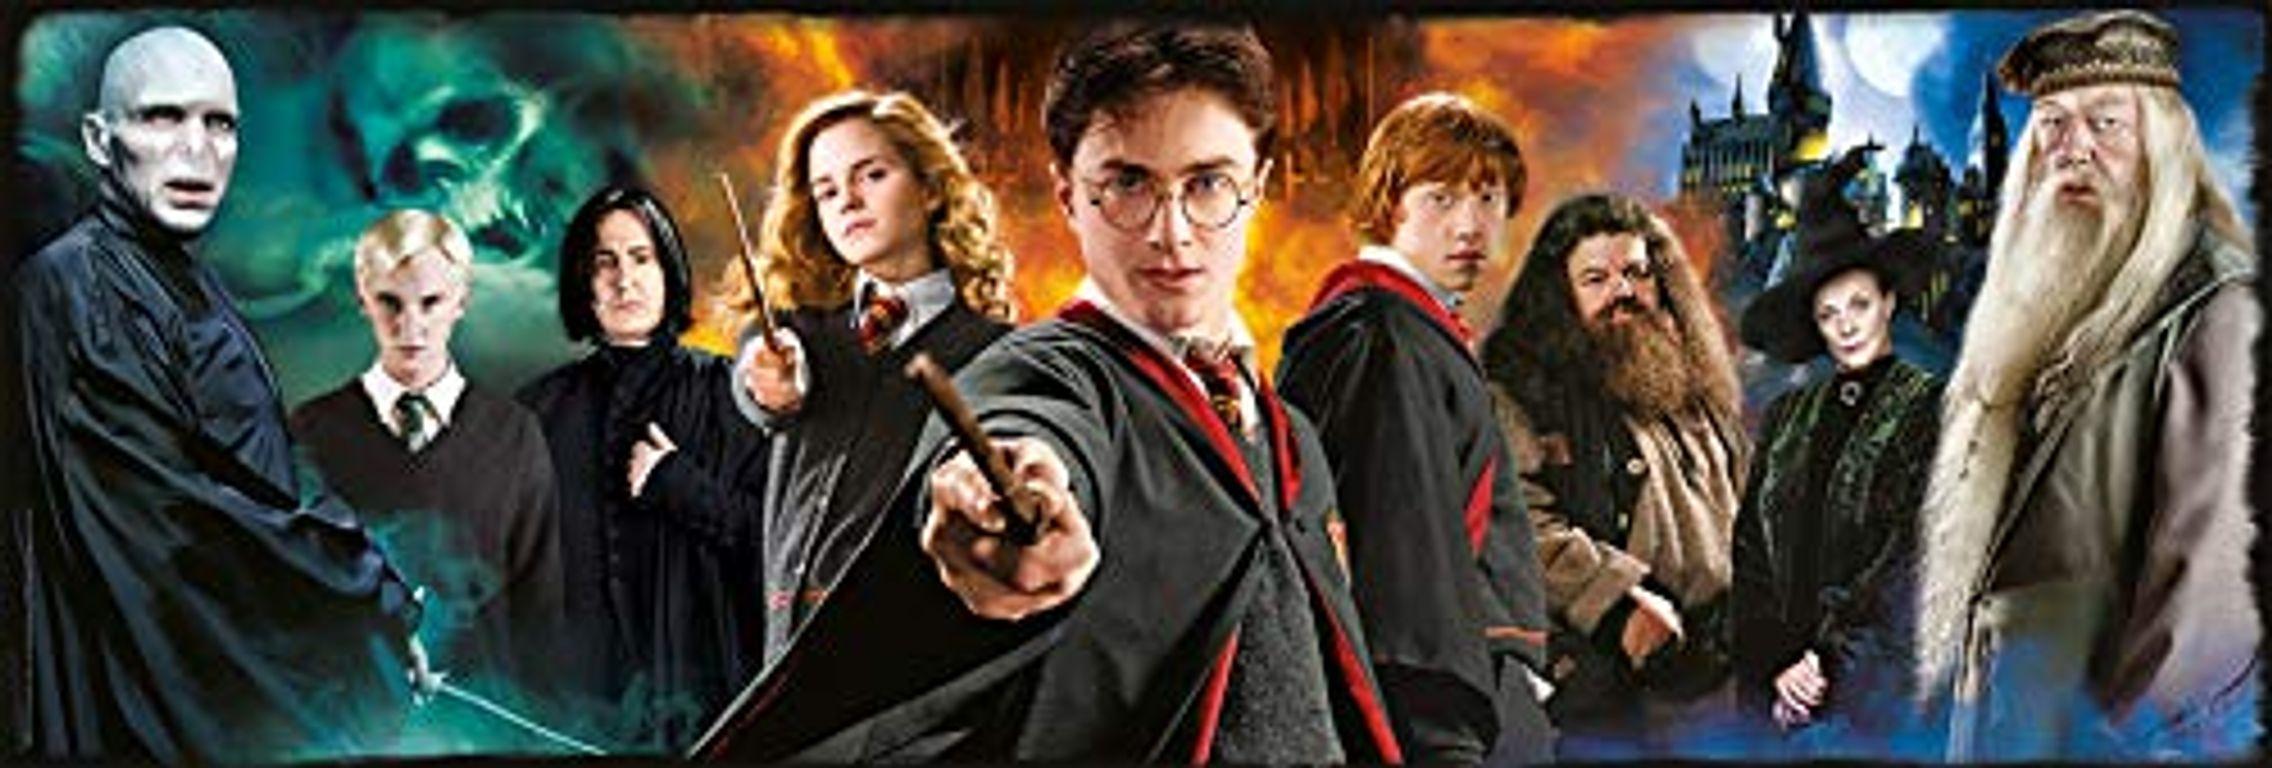 Harry Potter Panorama